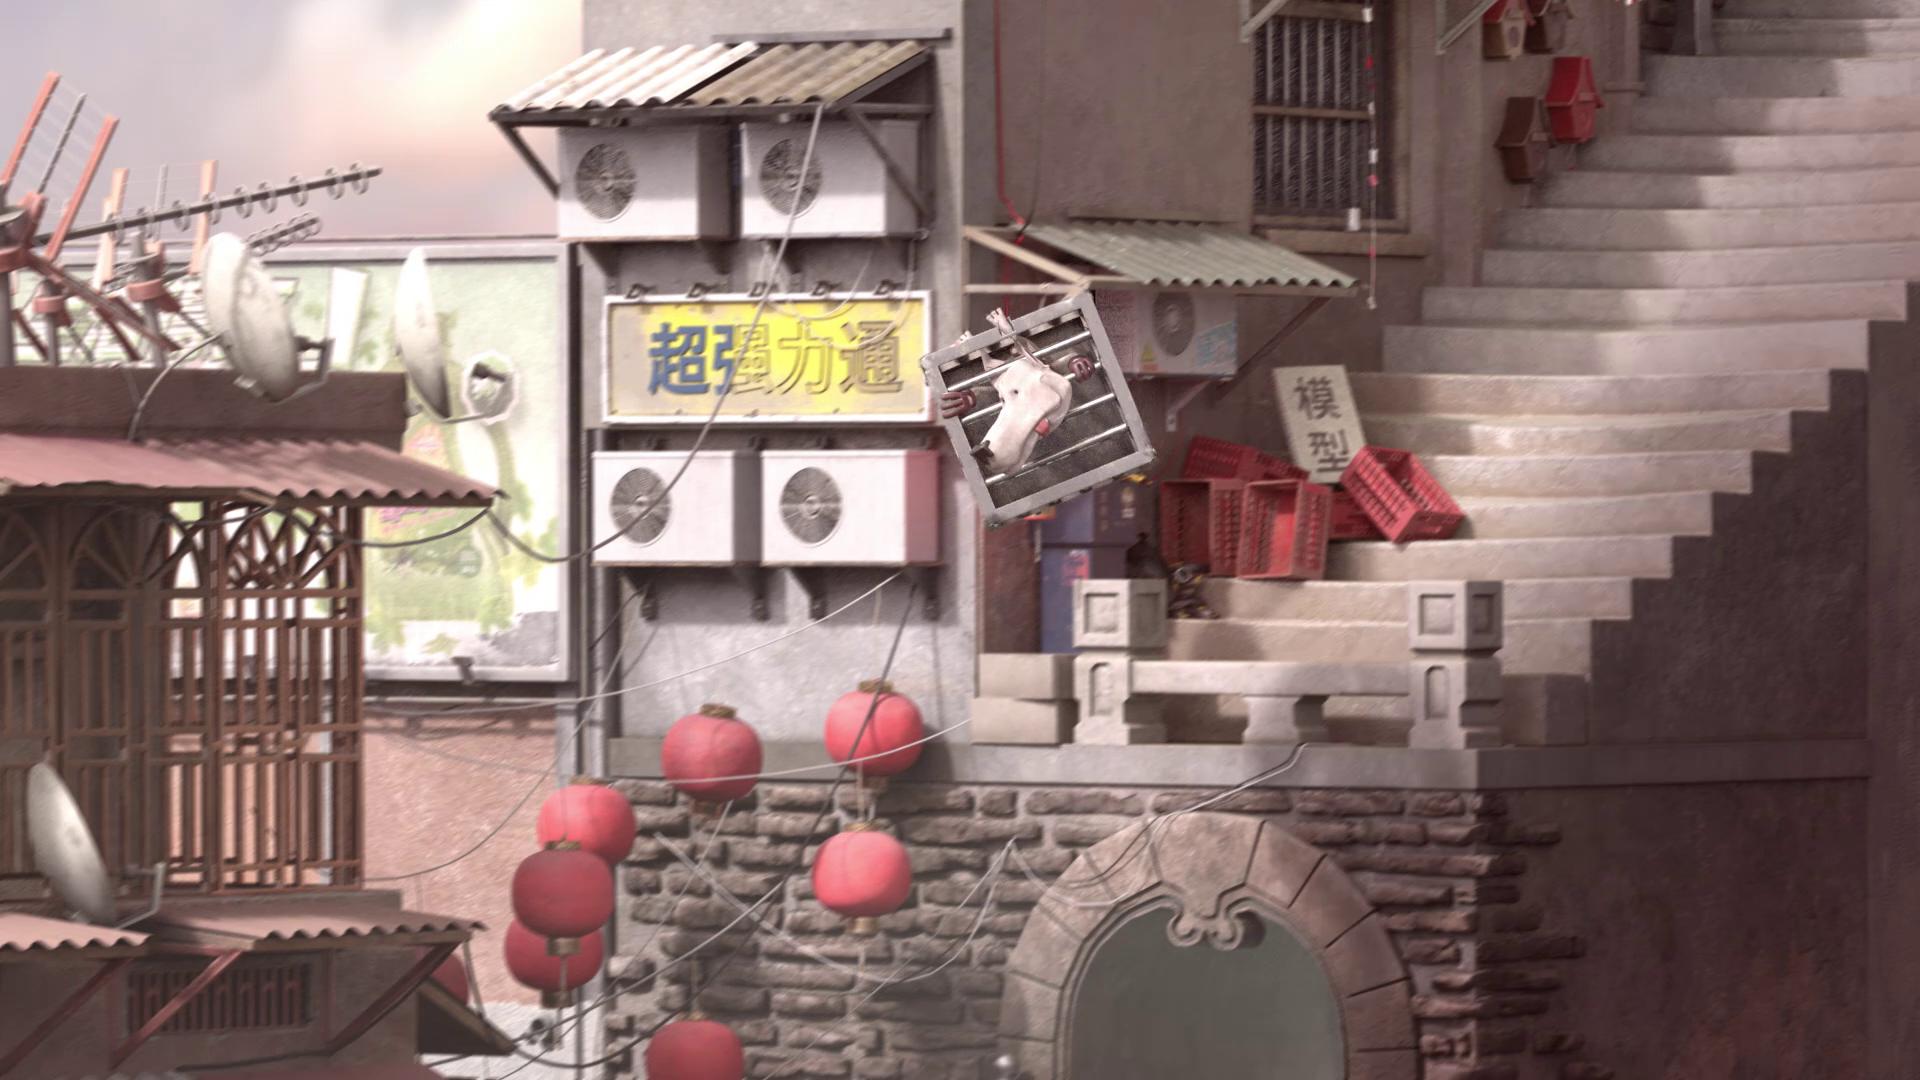 katharsis siriusmo music video animation 3D dog loop concept chinese environment